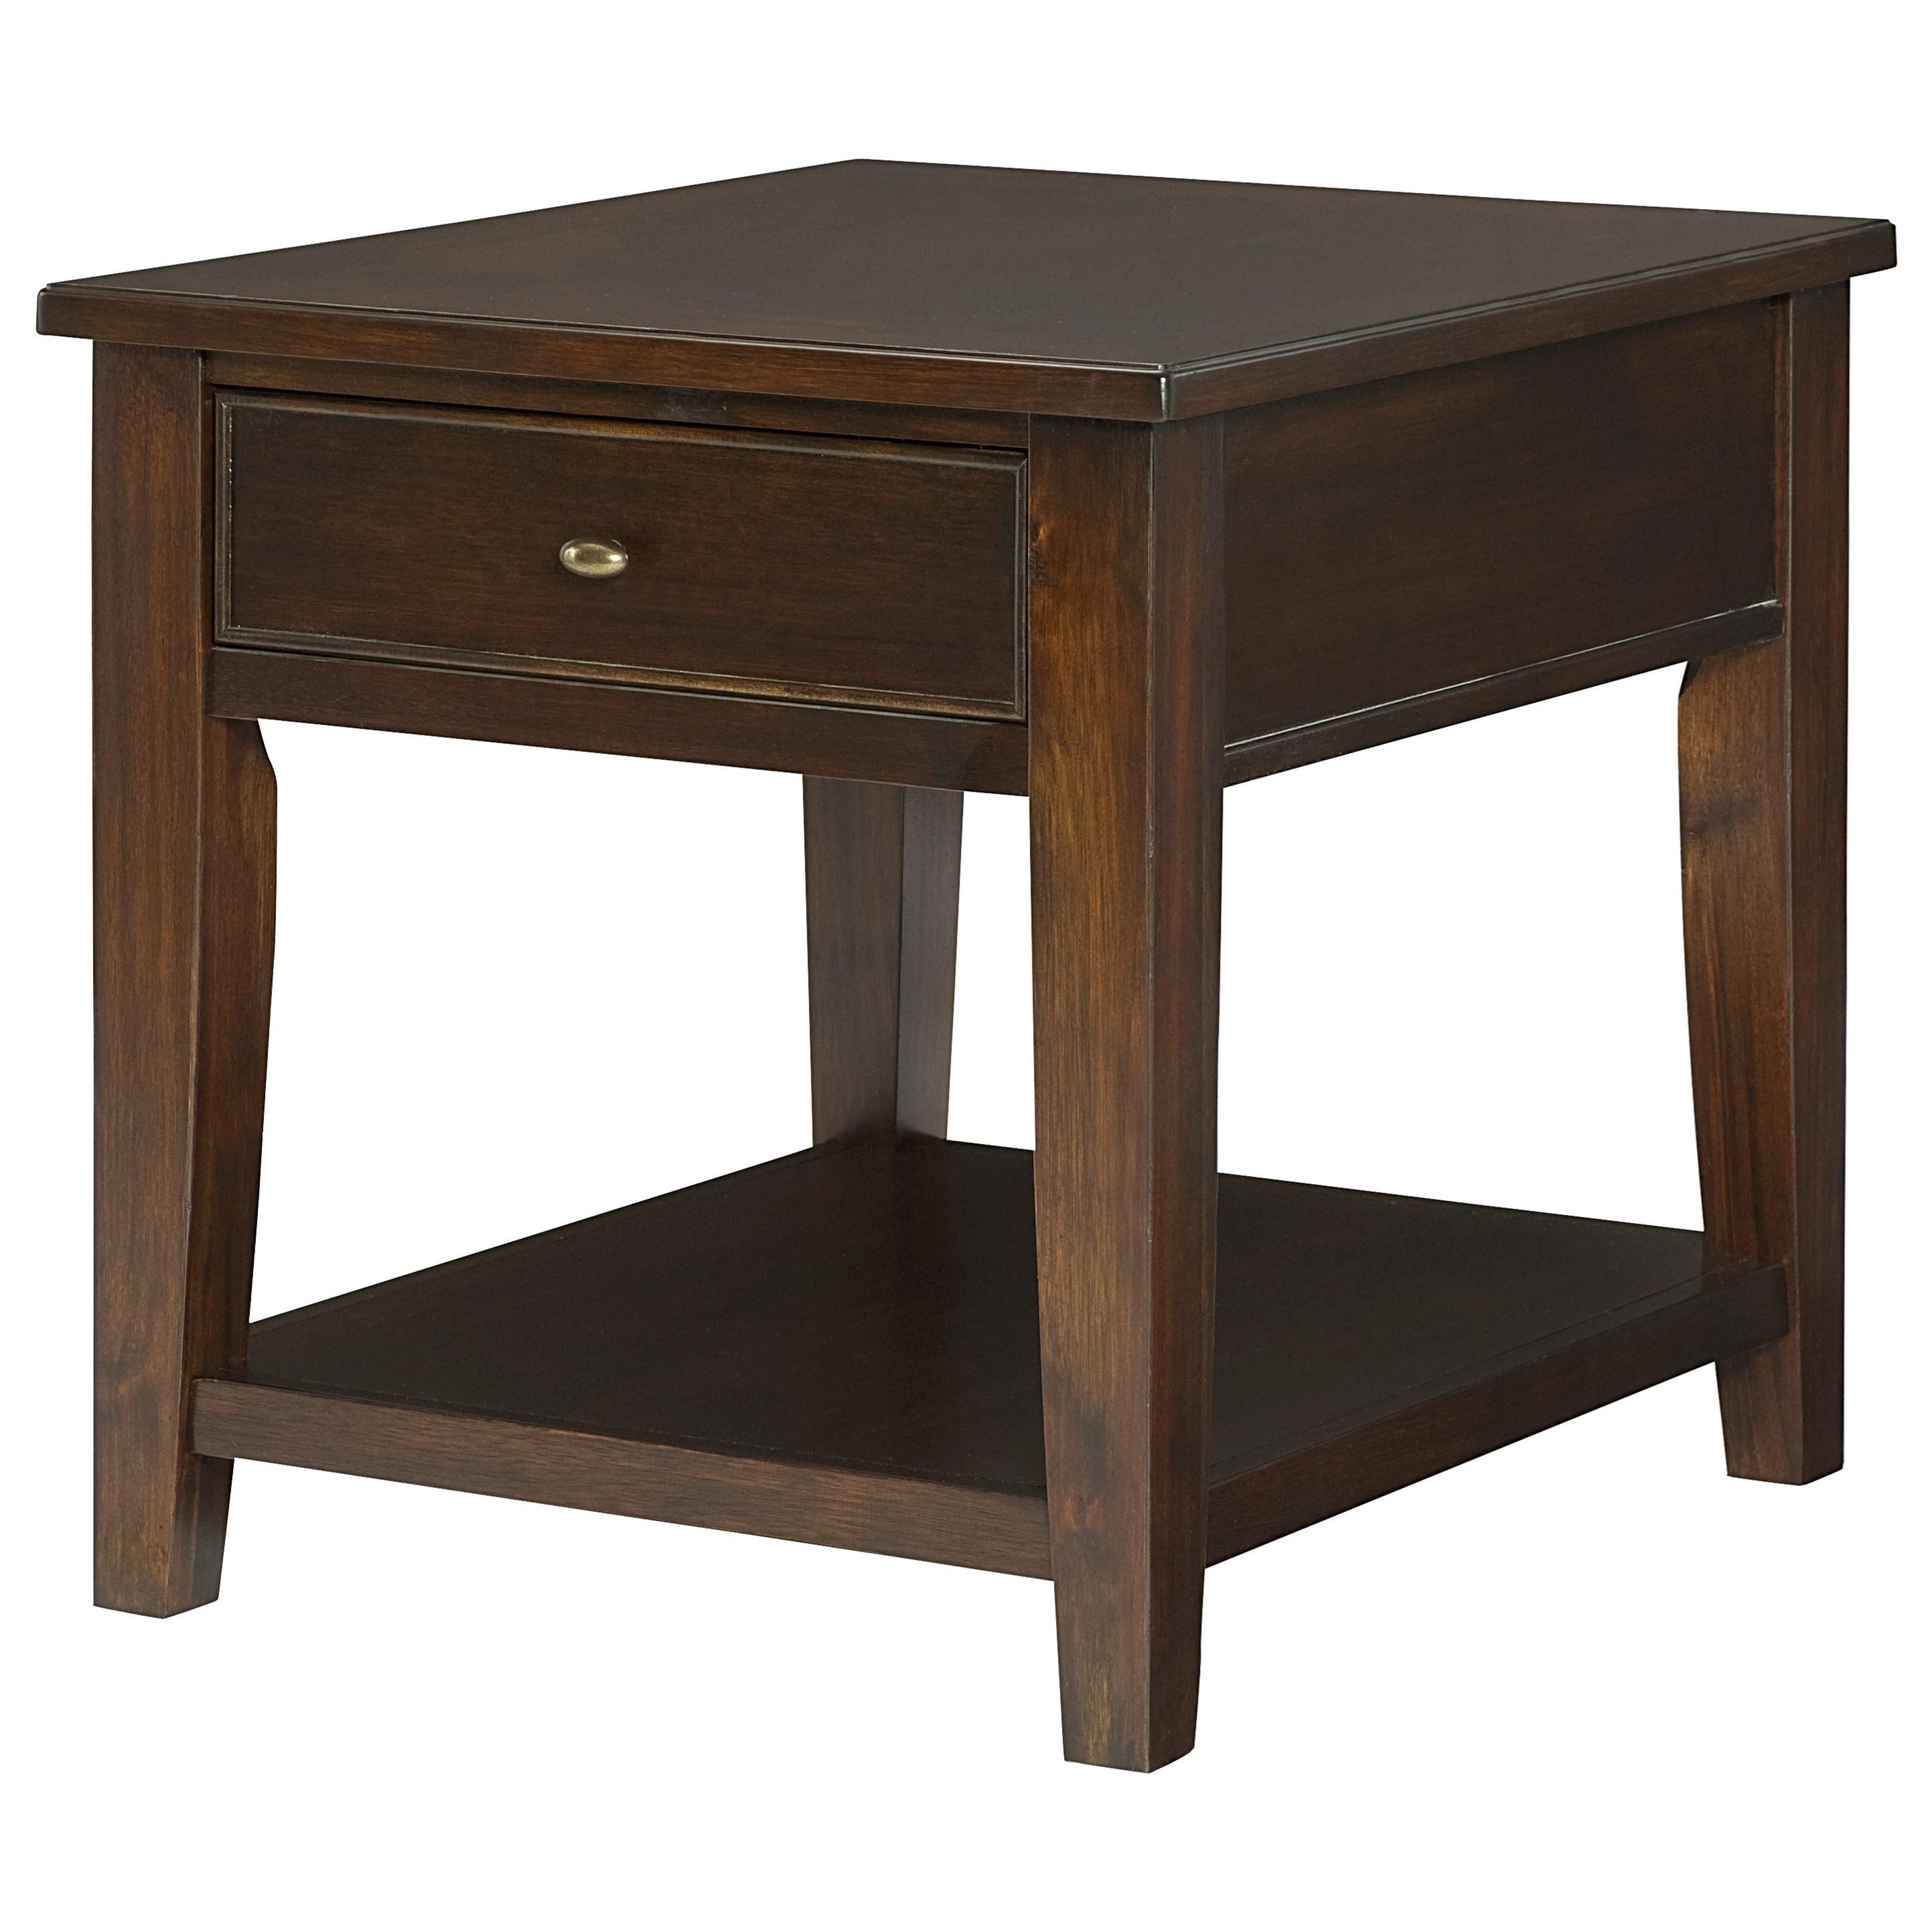 Hammary Boulevard Rectangular End Table - Item Number: 459-915